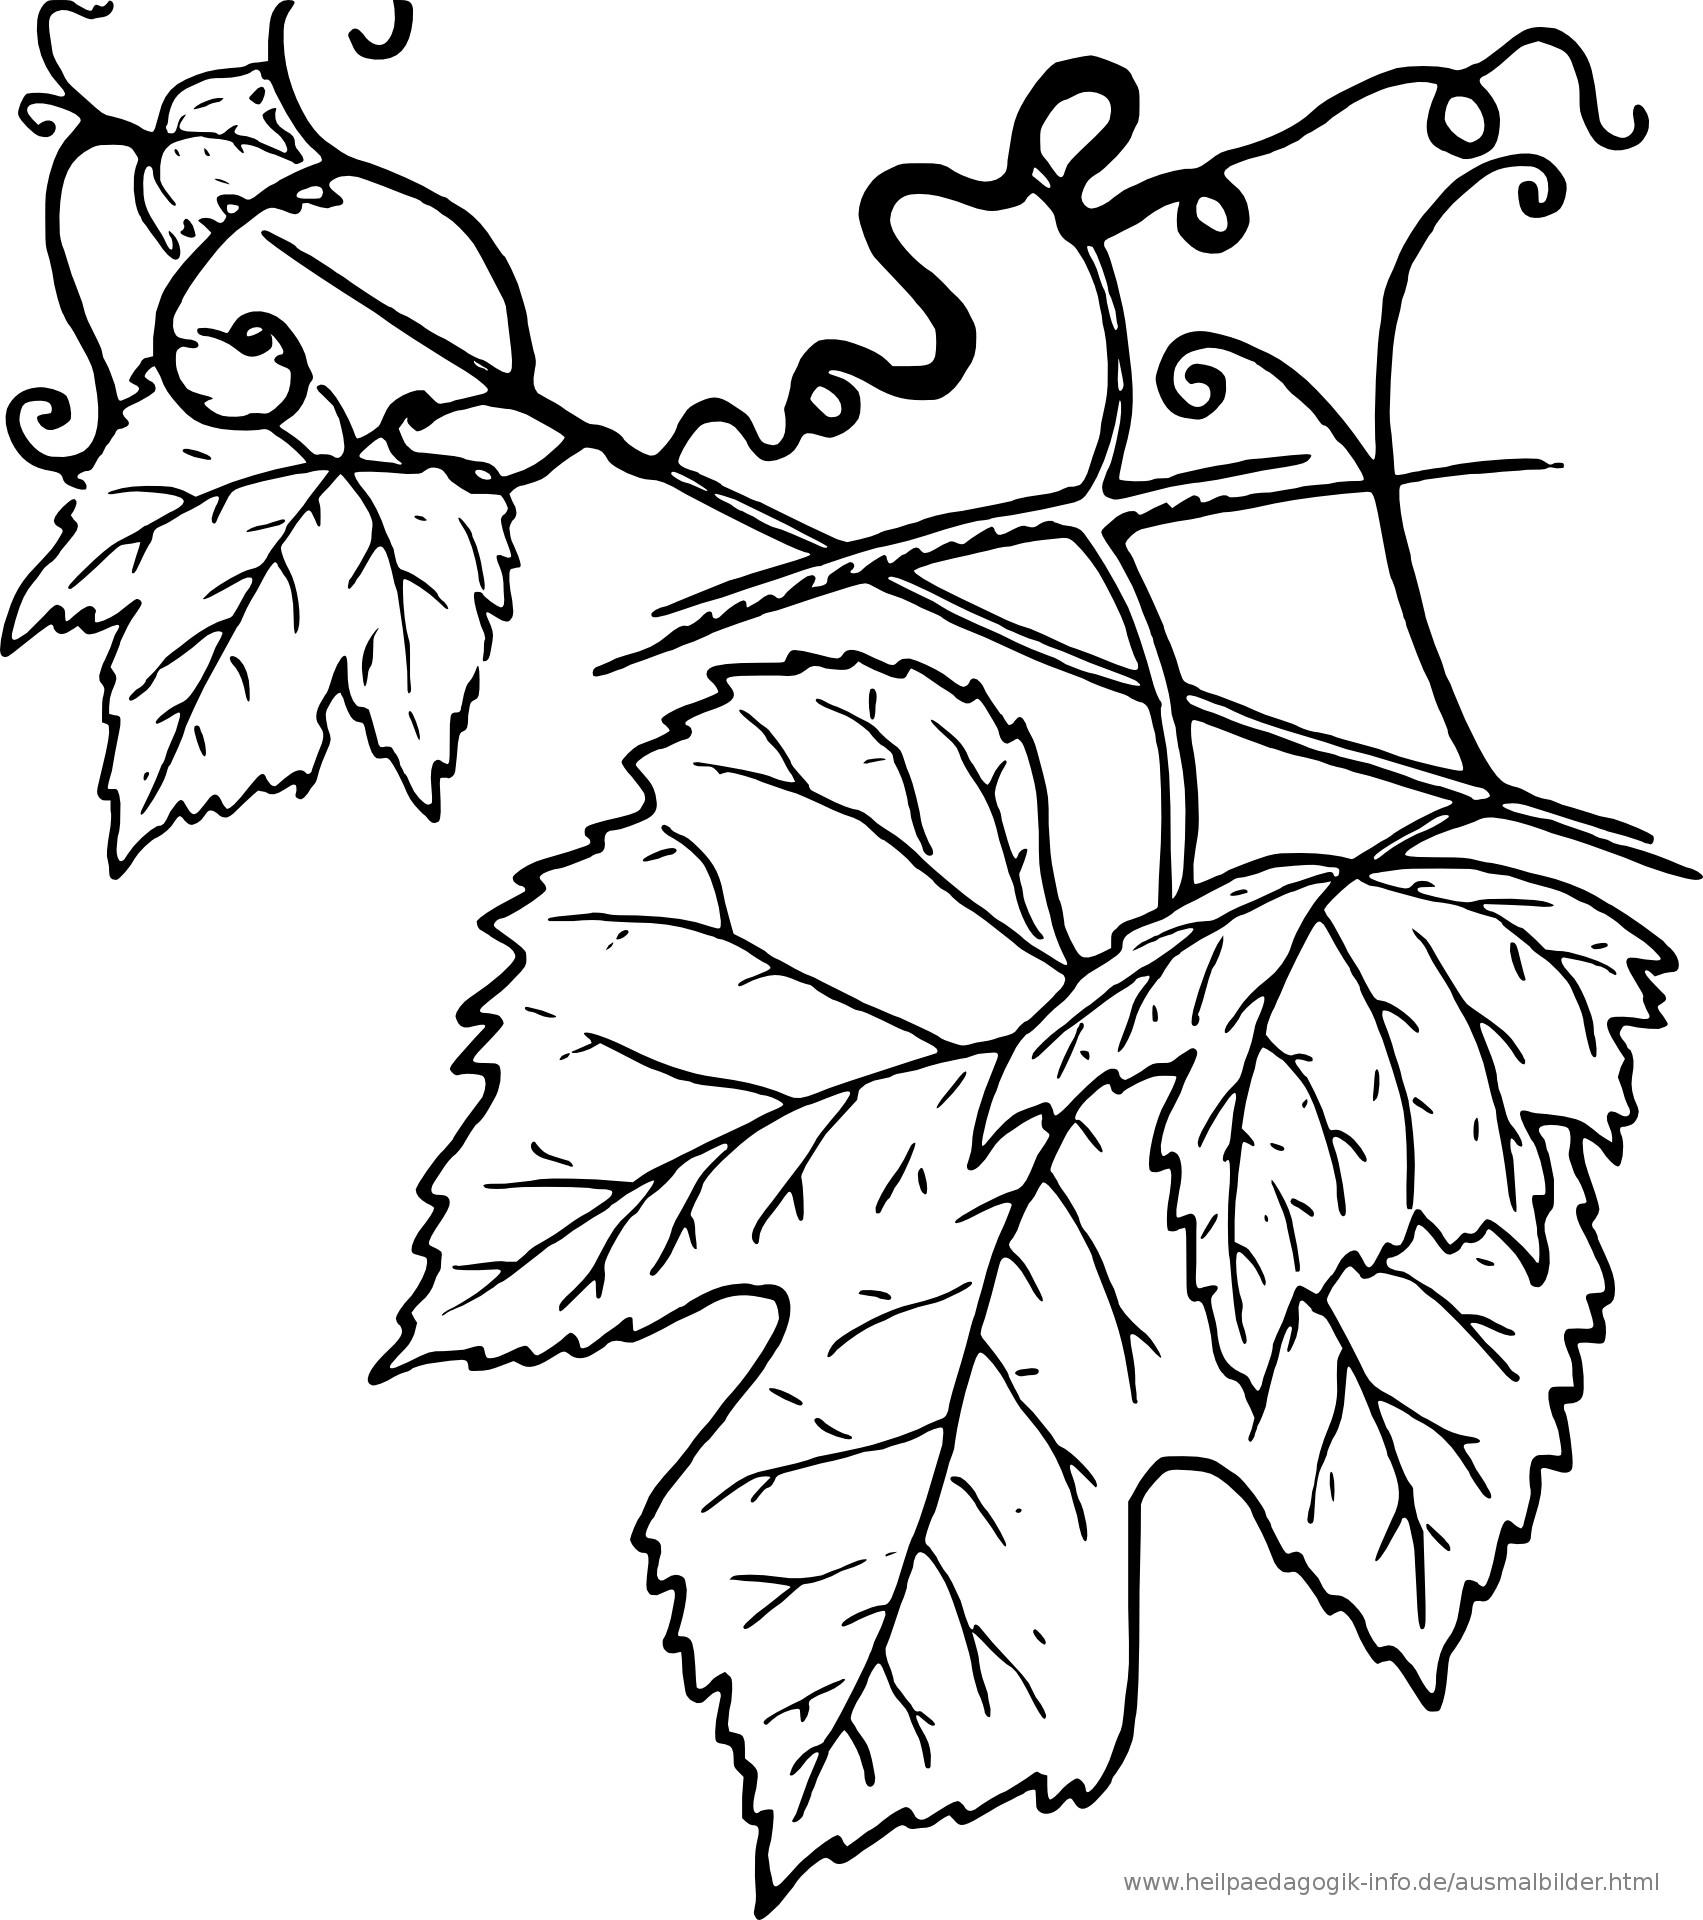 Ausmalbilder Blätter  Ausmalbilder Blumen Bäume Blätter